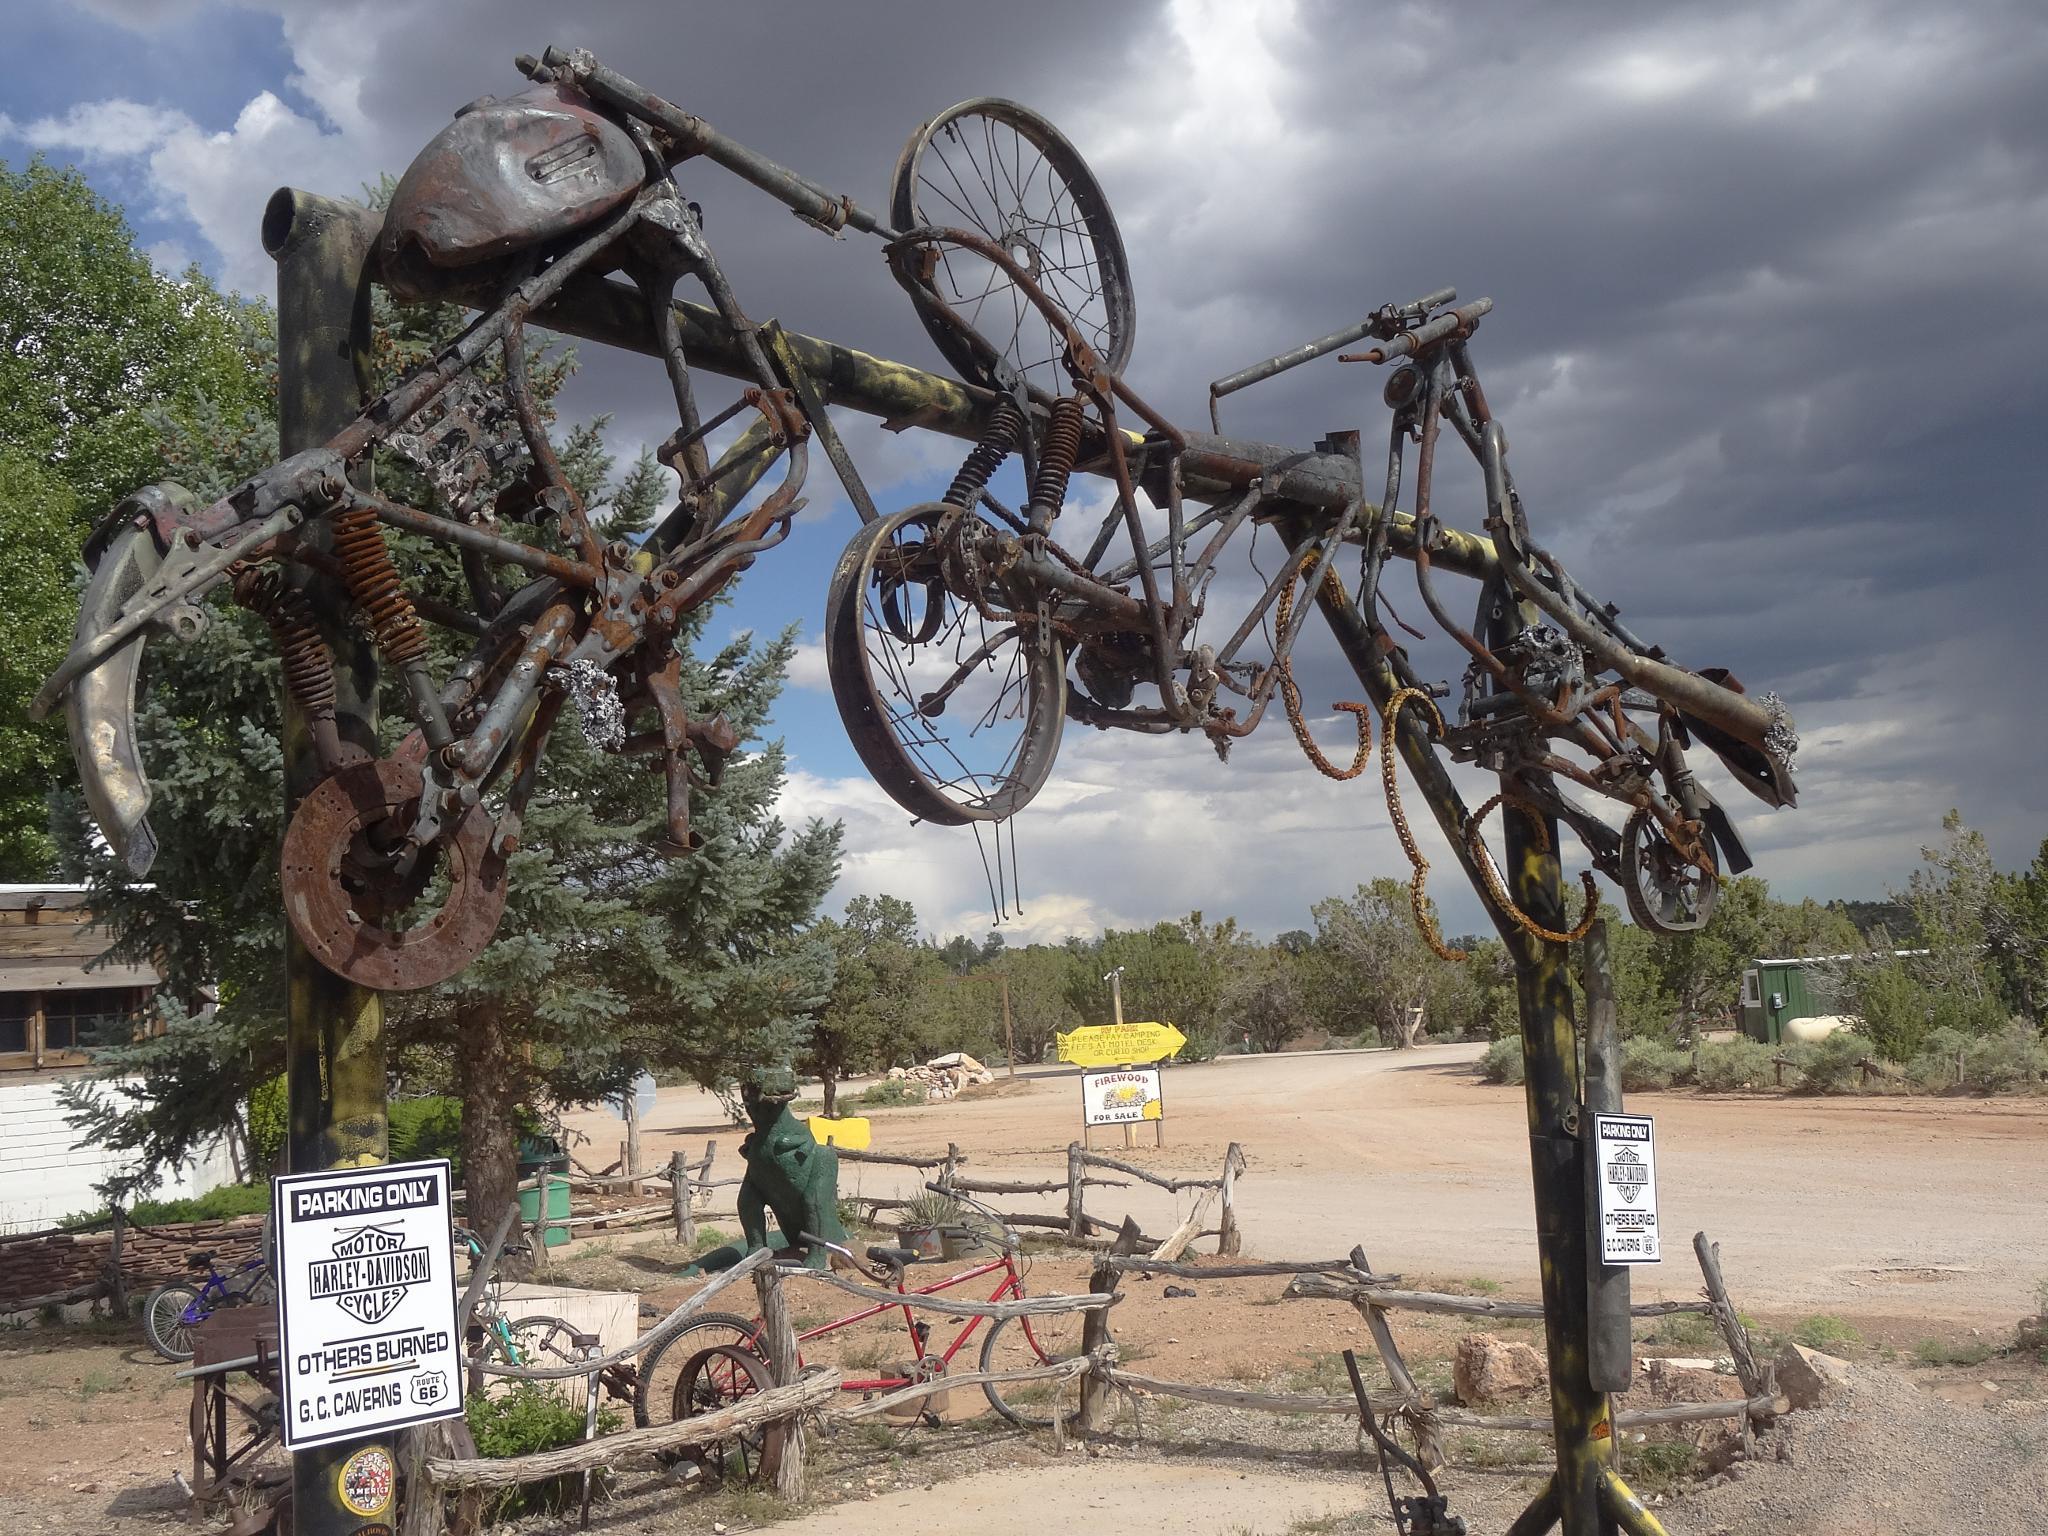 Route 66: Arizona Bike Parking 2 by Carolyn Chase